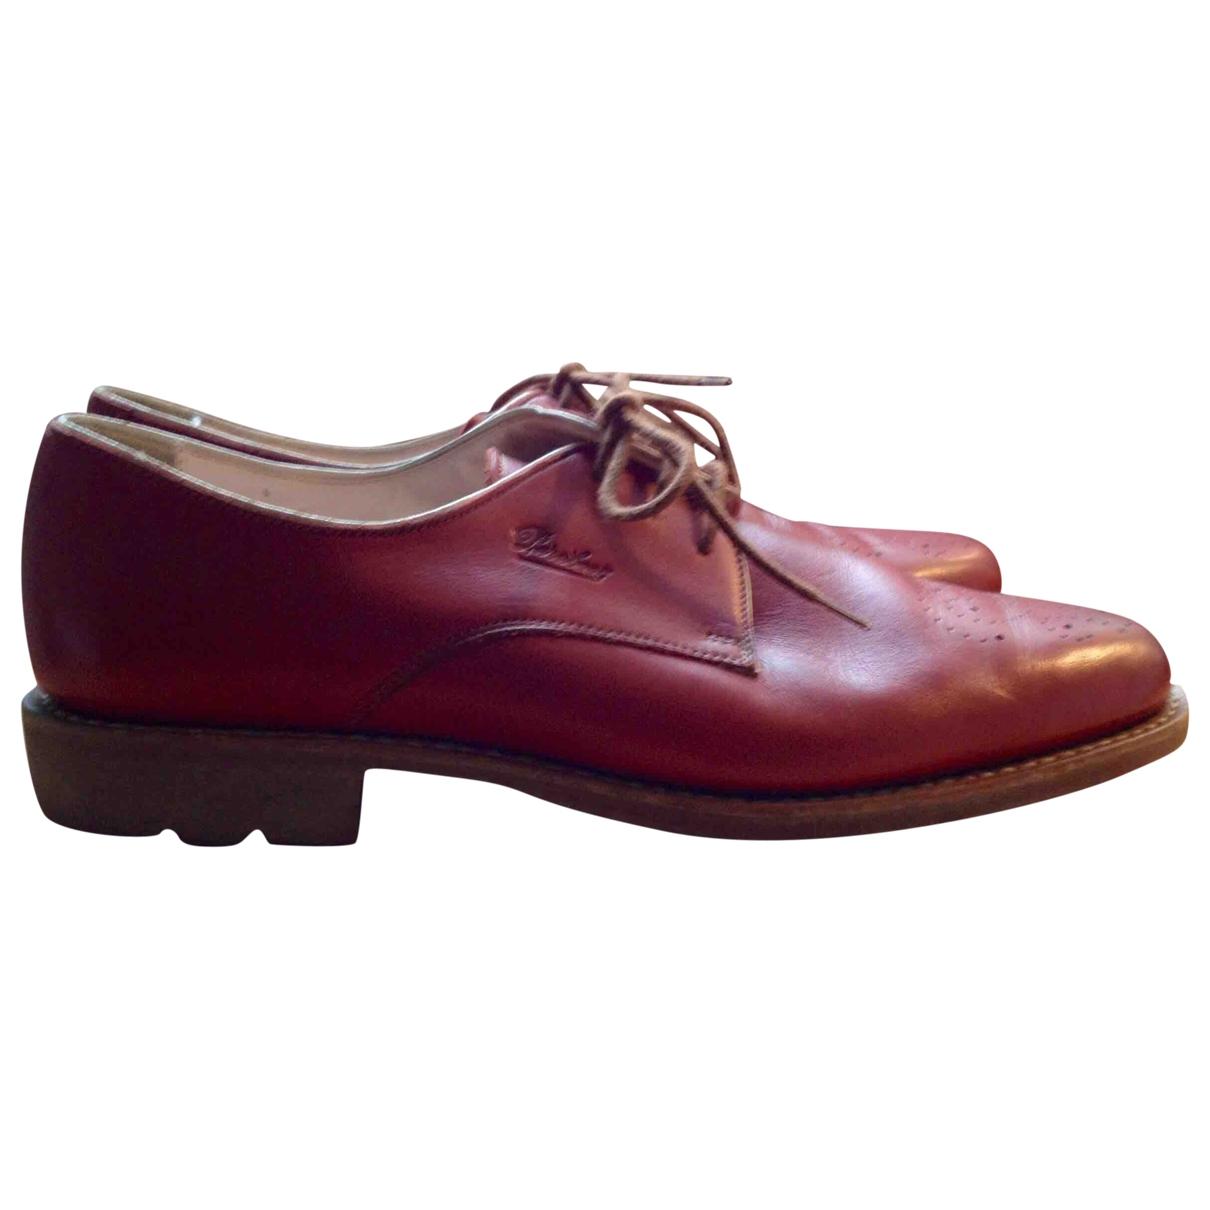 Paraboot \N Burgundy Leather Heels for Women 4 UK